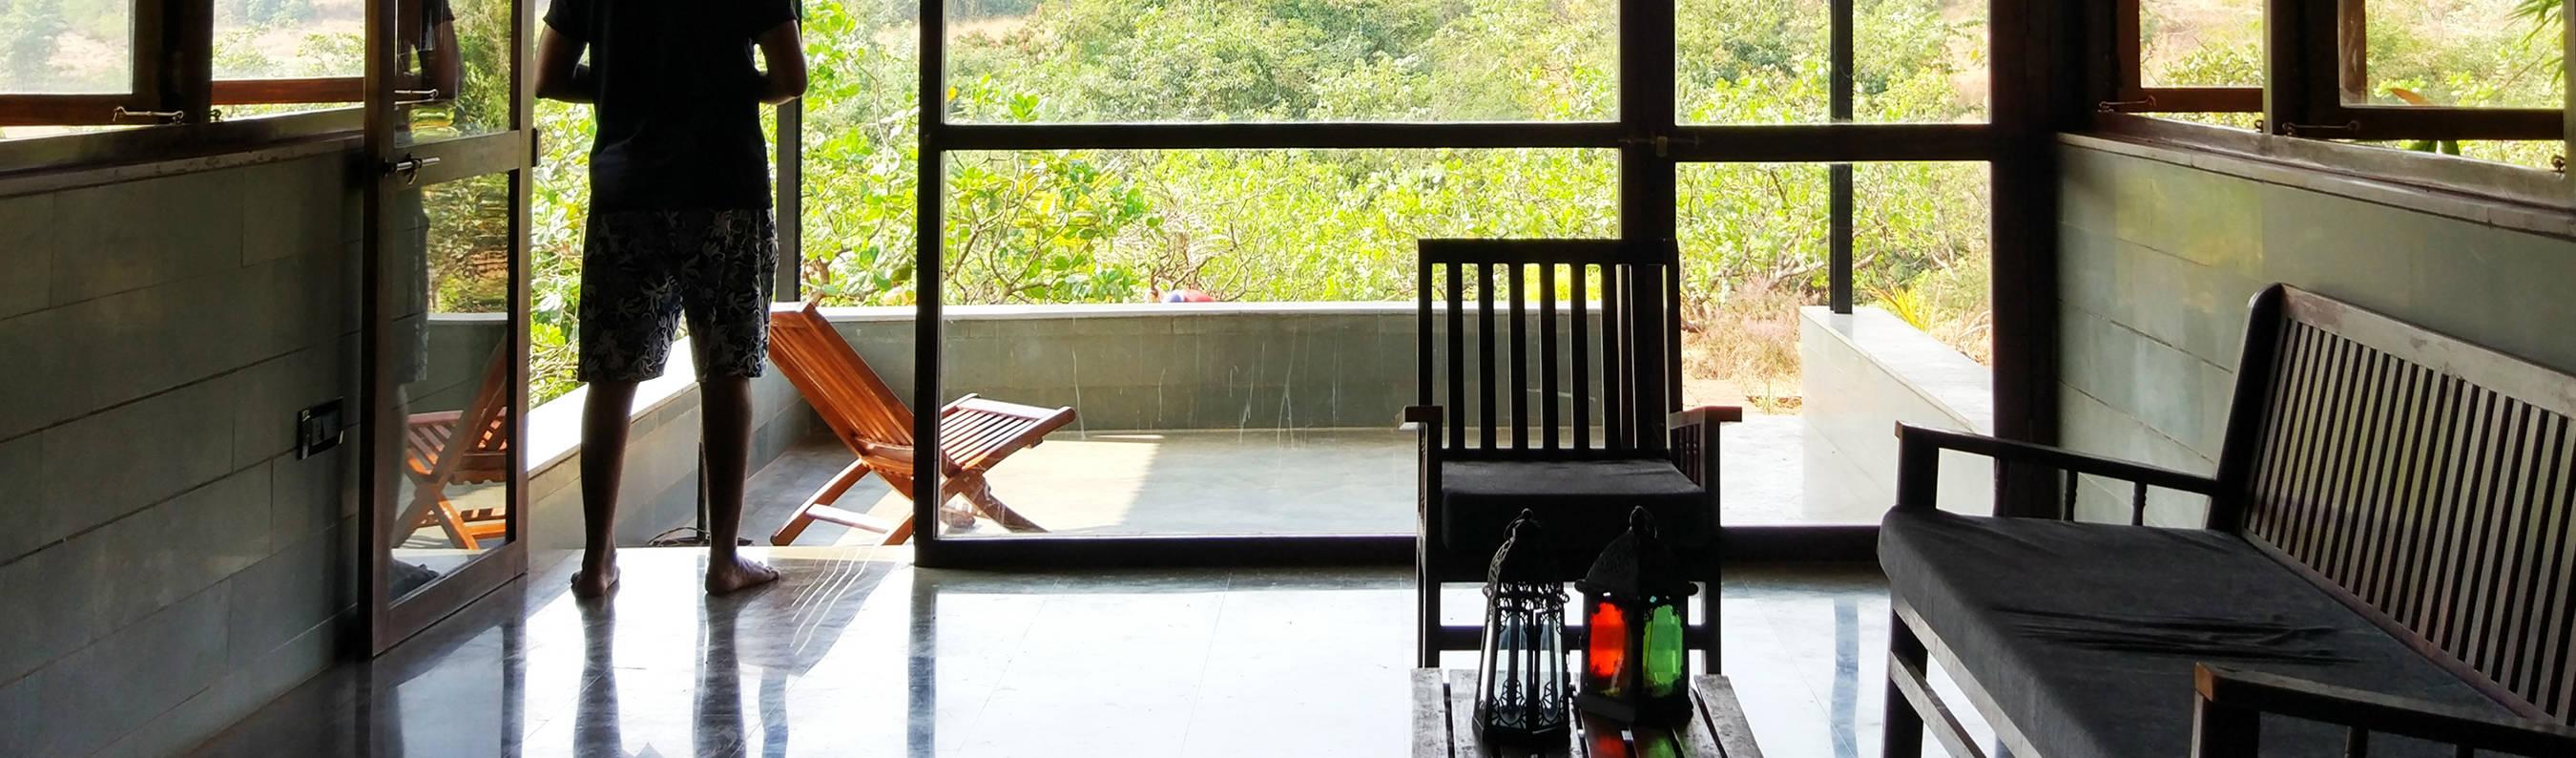 unTAG Architecture and Interiors